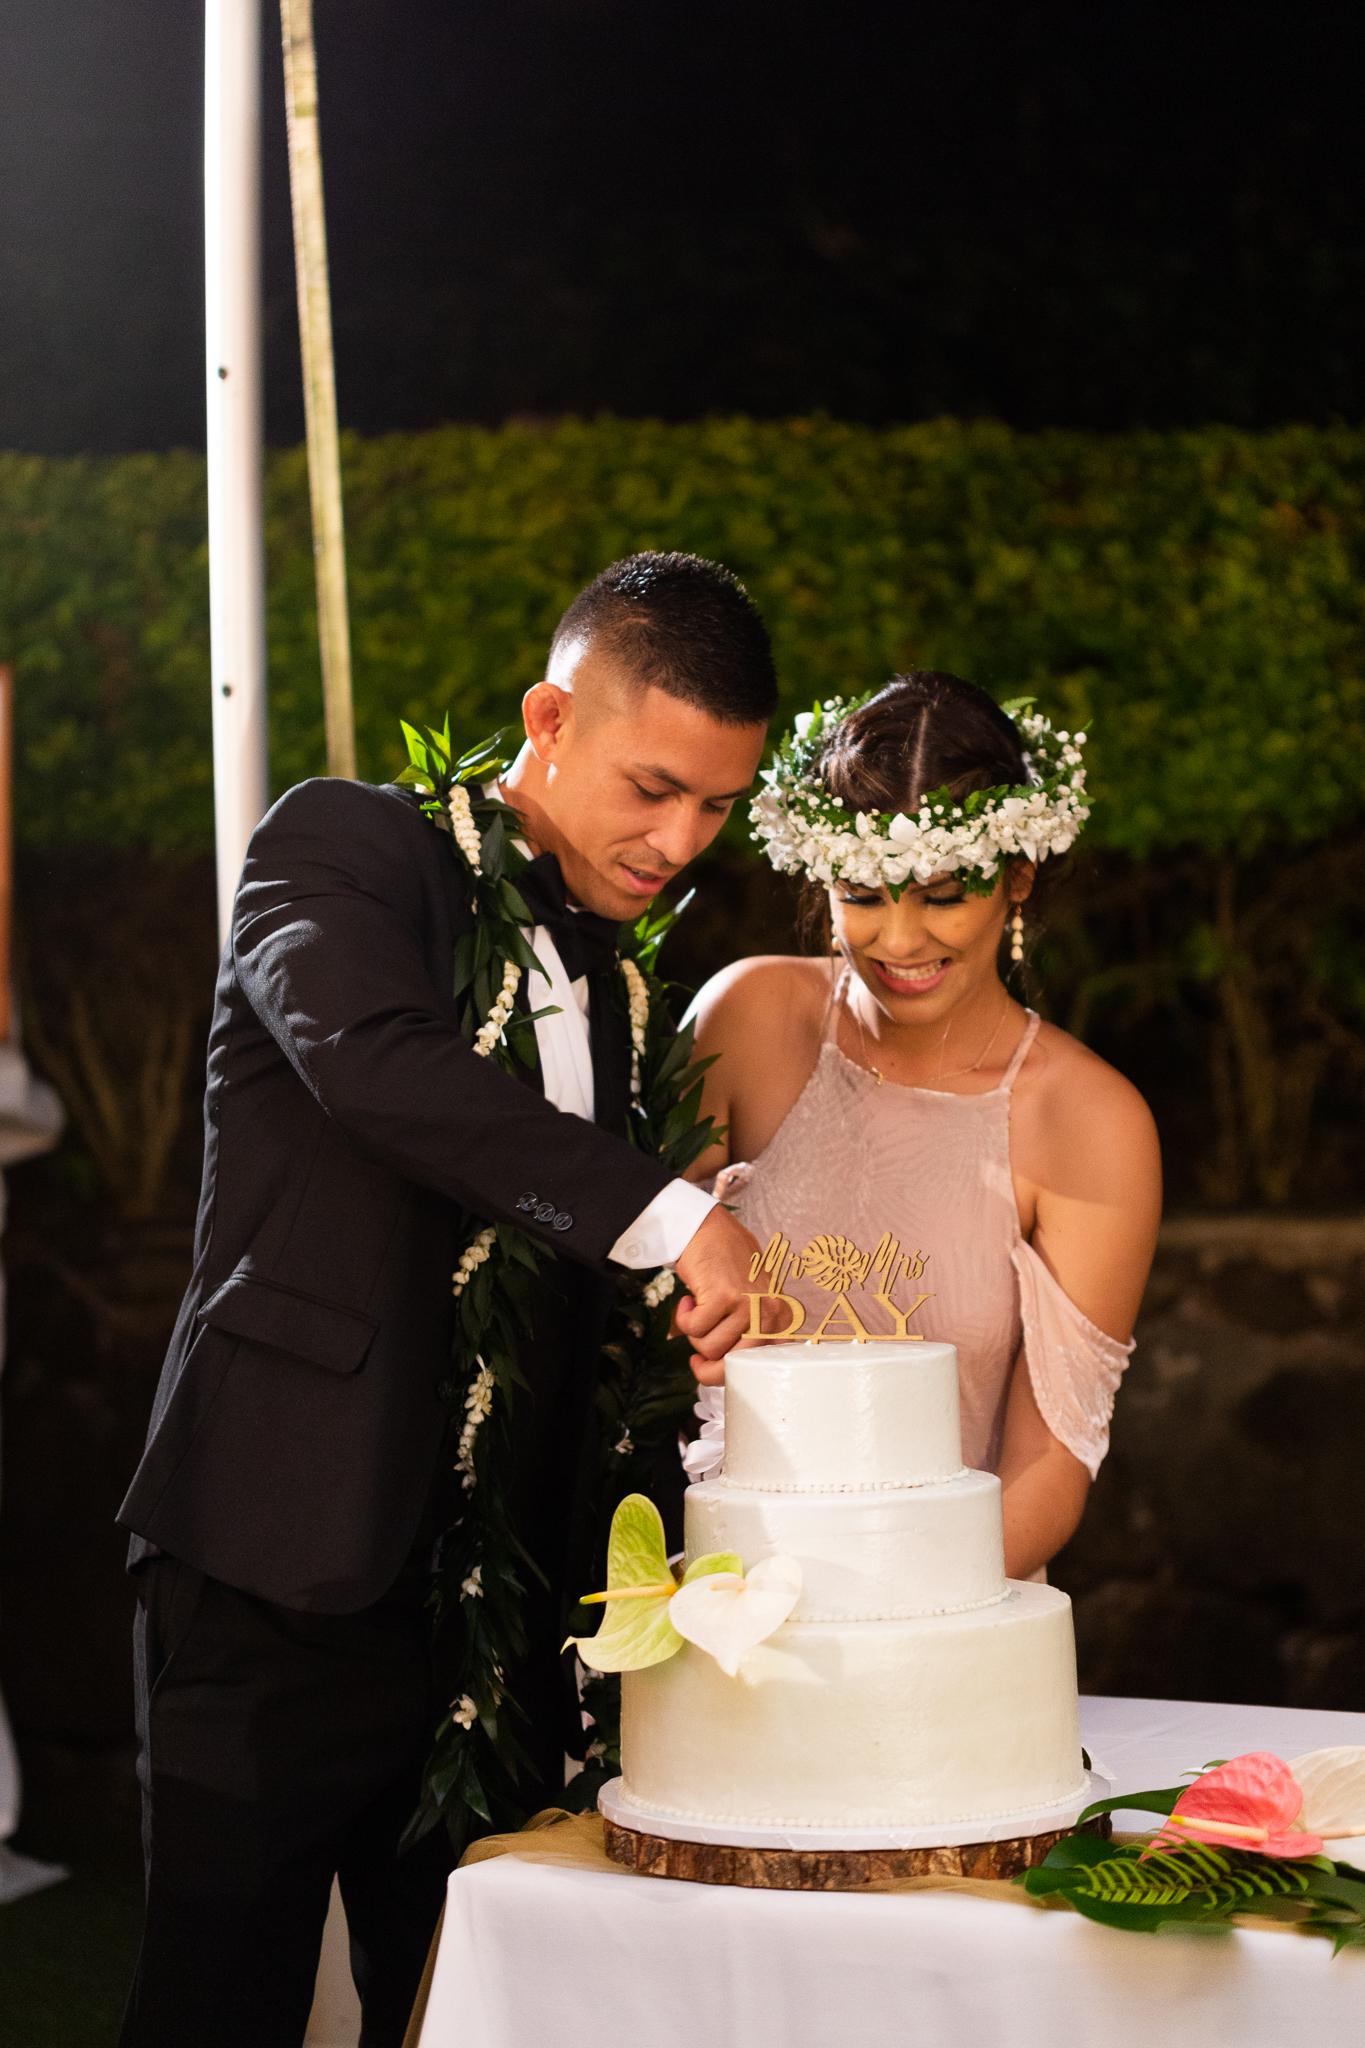 Kualoa_Ranch_Wedding_Photographer_Tone_Hawaii-42.jpg